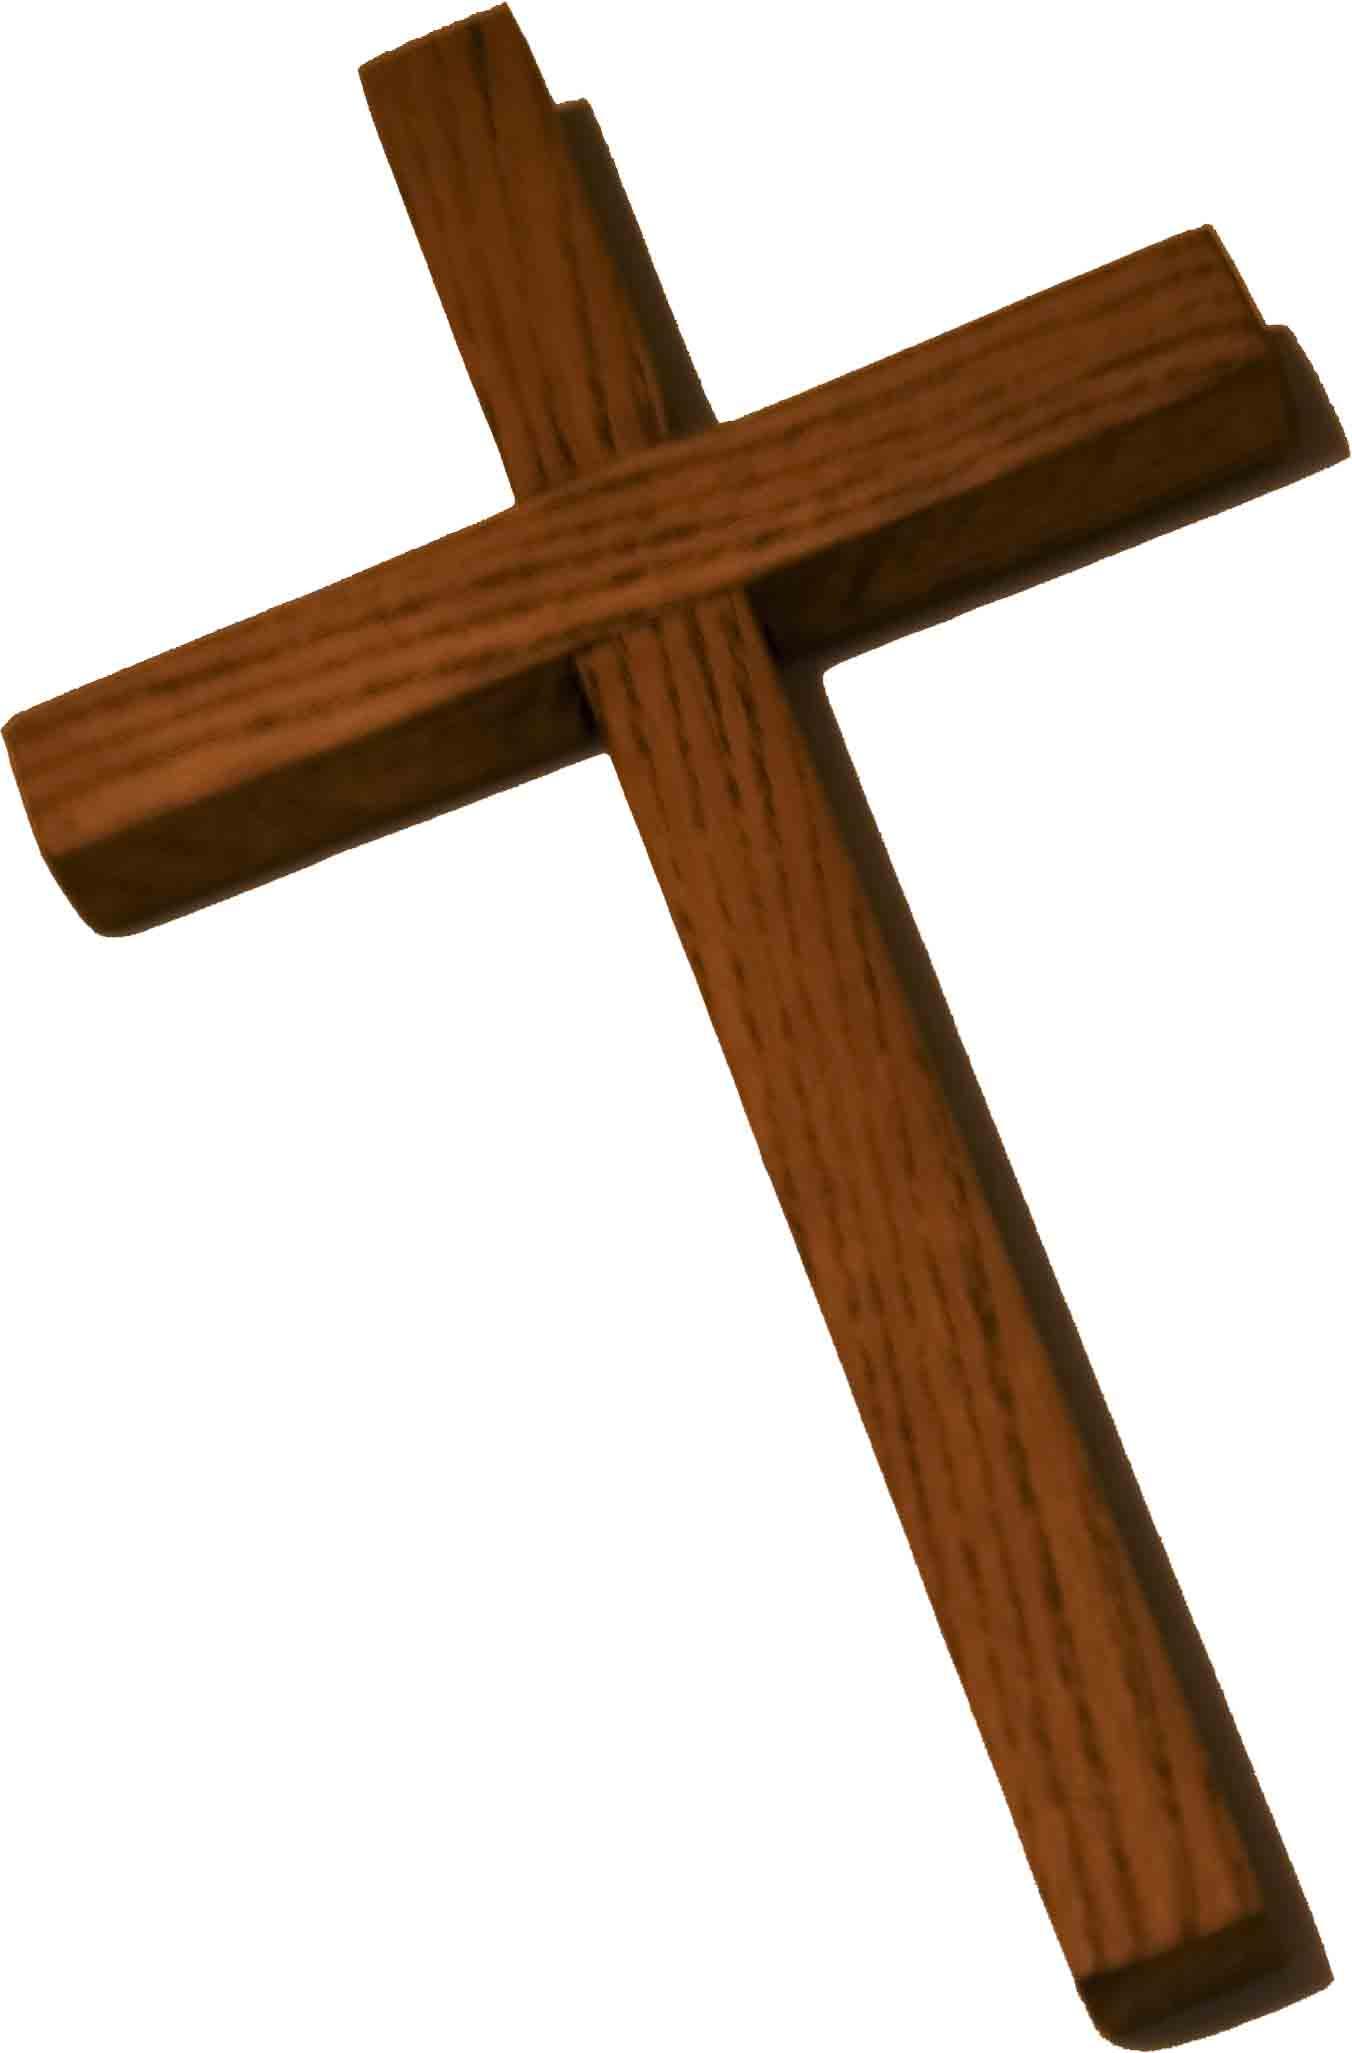 Wooden Cross Clipart Clipart Suggest